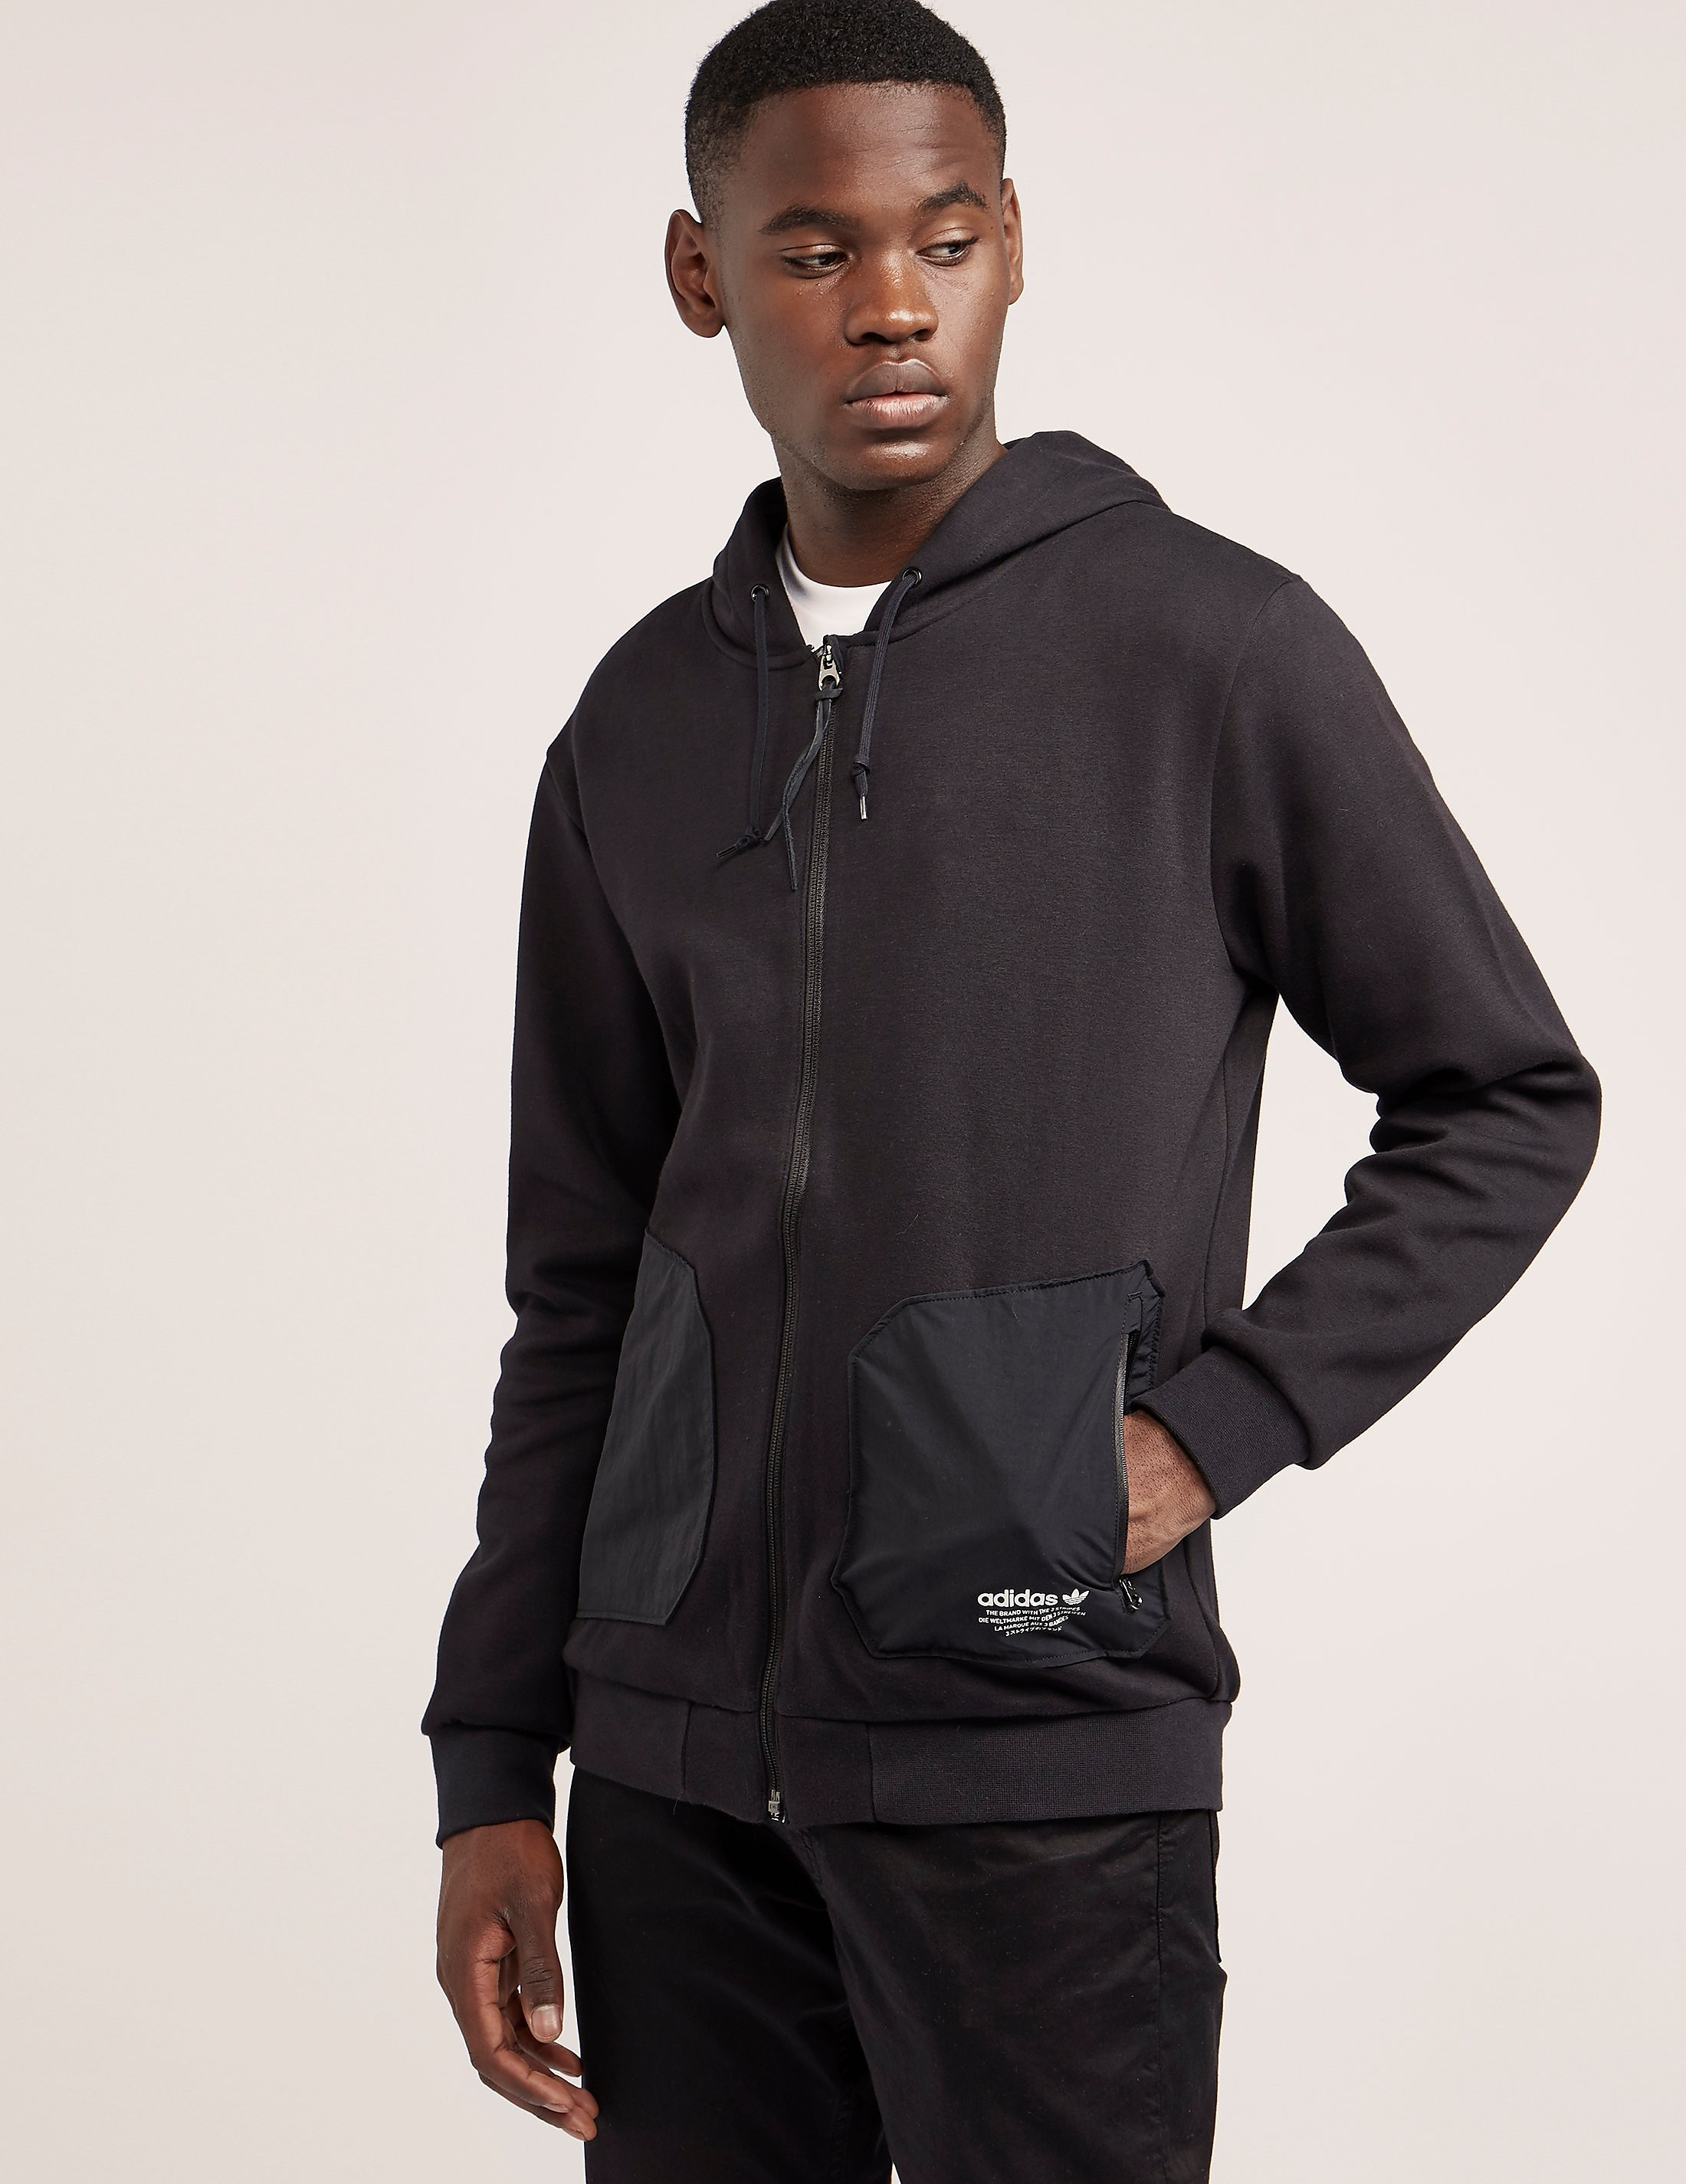 adidas Originals NMD Full Zip Hoody